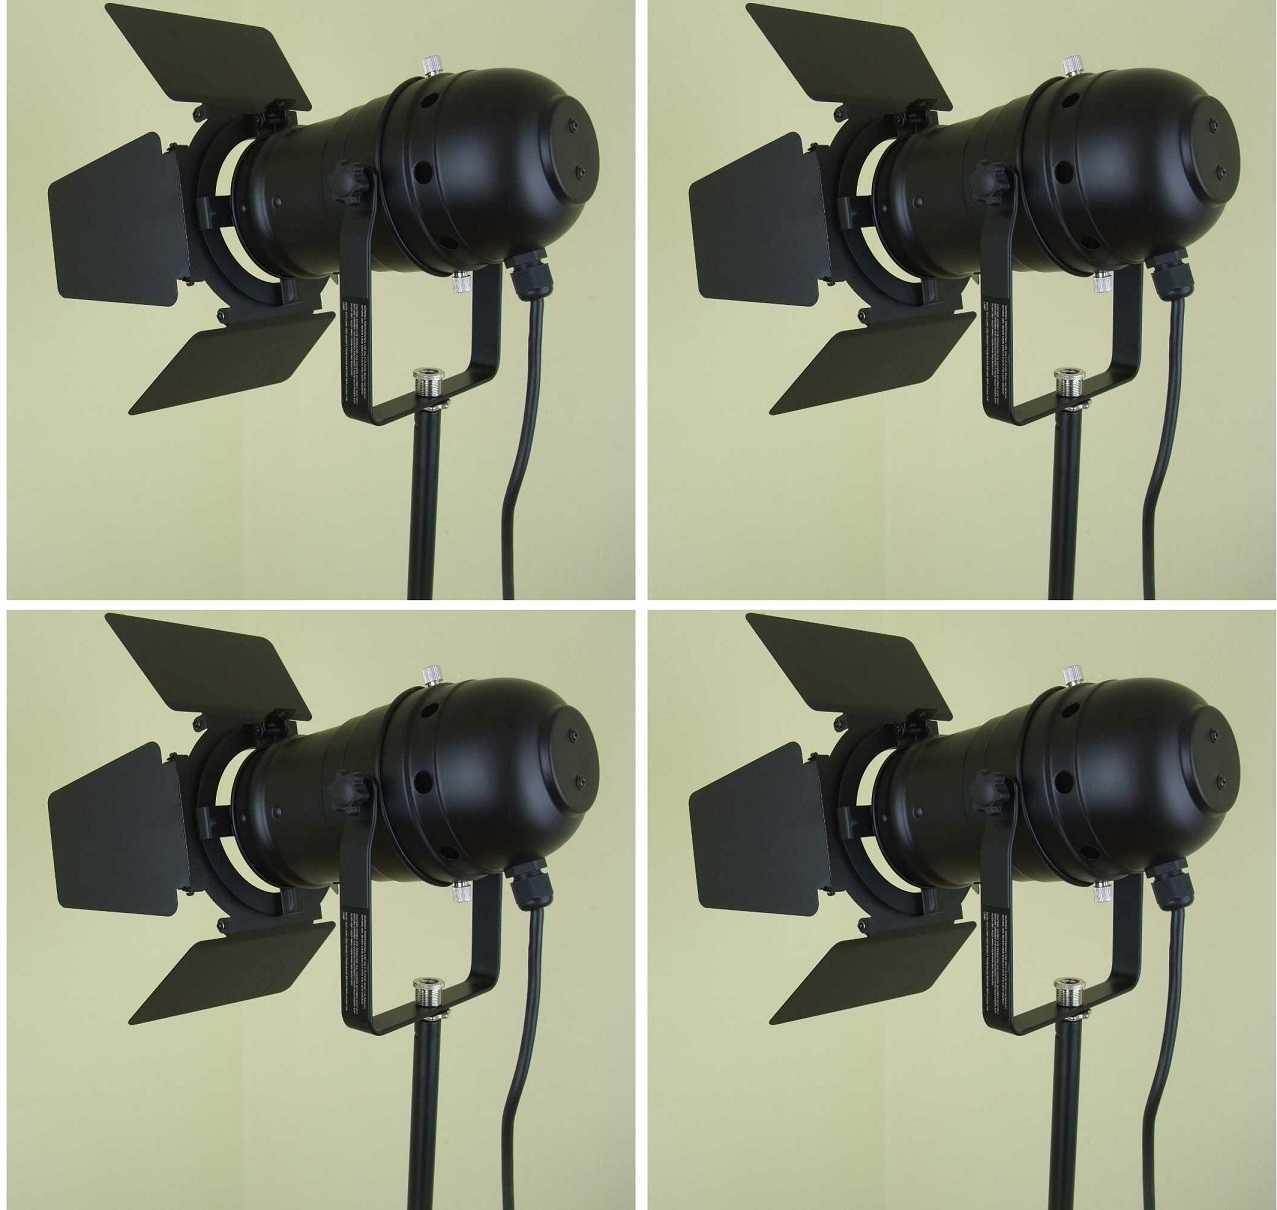 4 x PAR-30 Spot Schwarz mit Barn-Door Flügel-Tor-Blende E27 Fassung Scheinwerfer